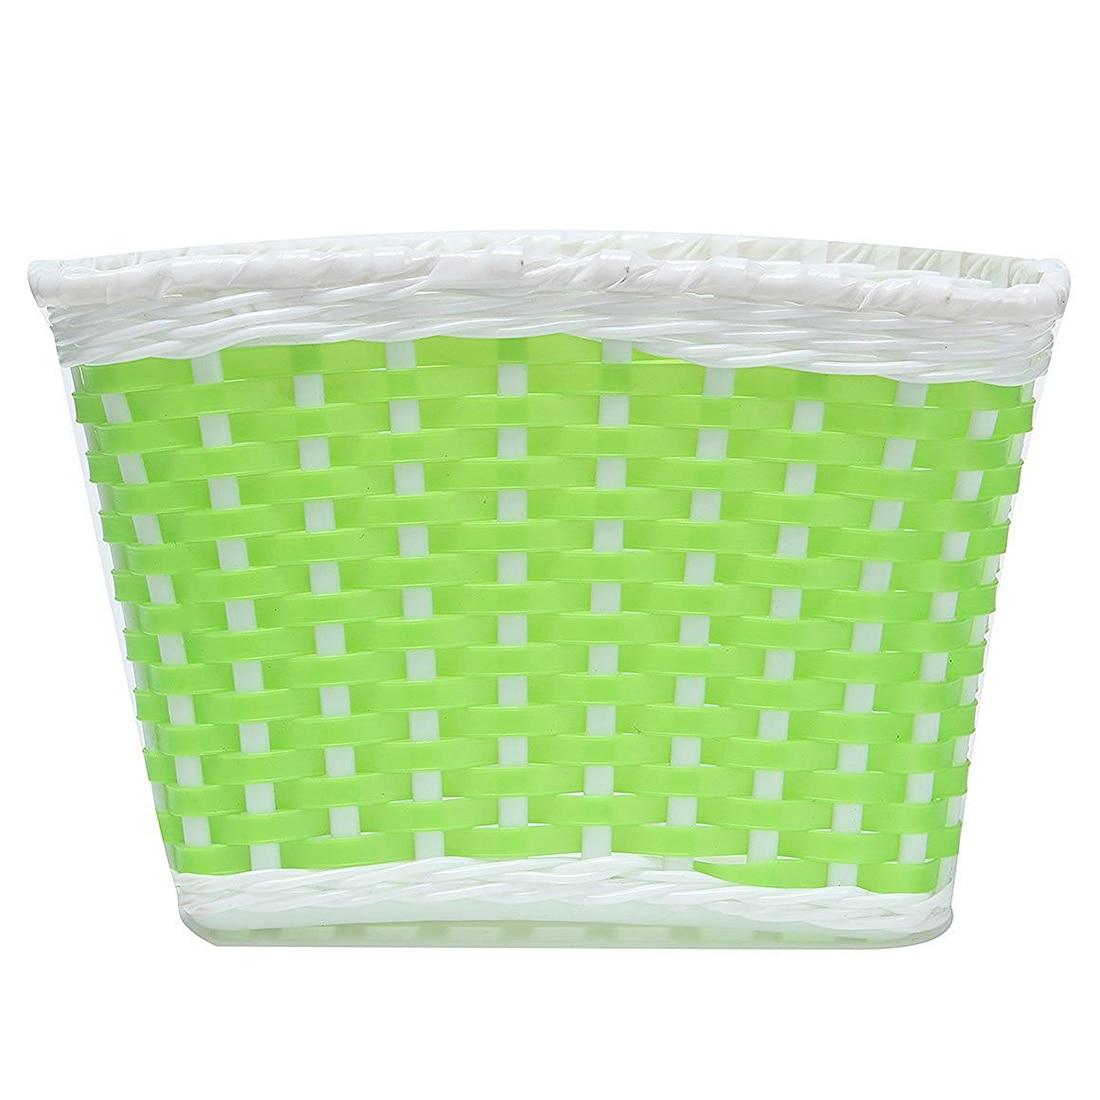 Children Bicycle basket Shopping basket Luggage carrier Handlebar basket Bike handle basket green